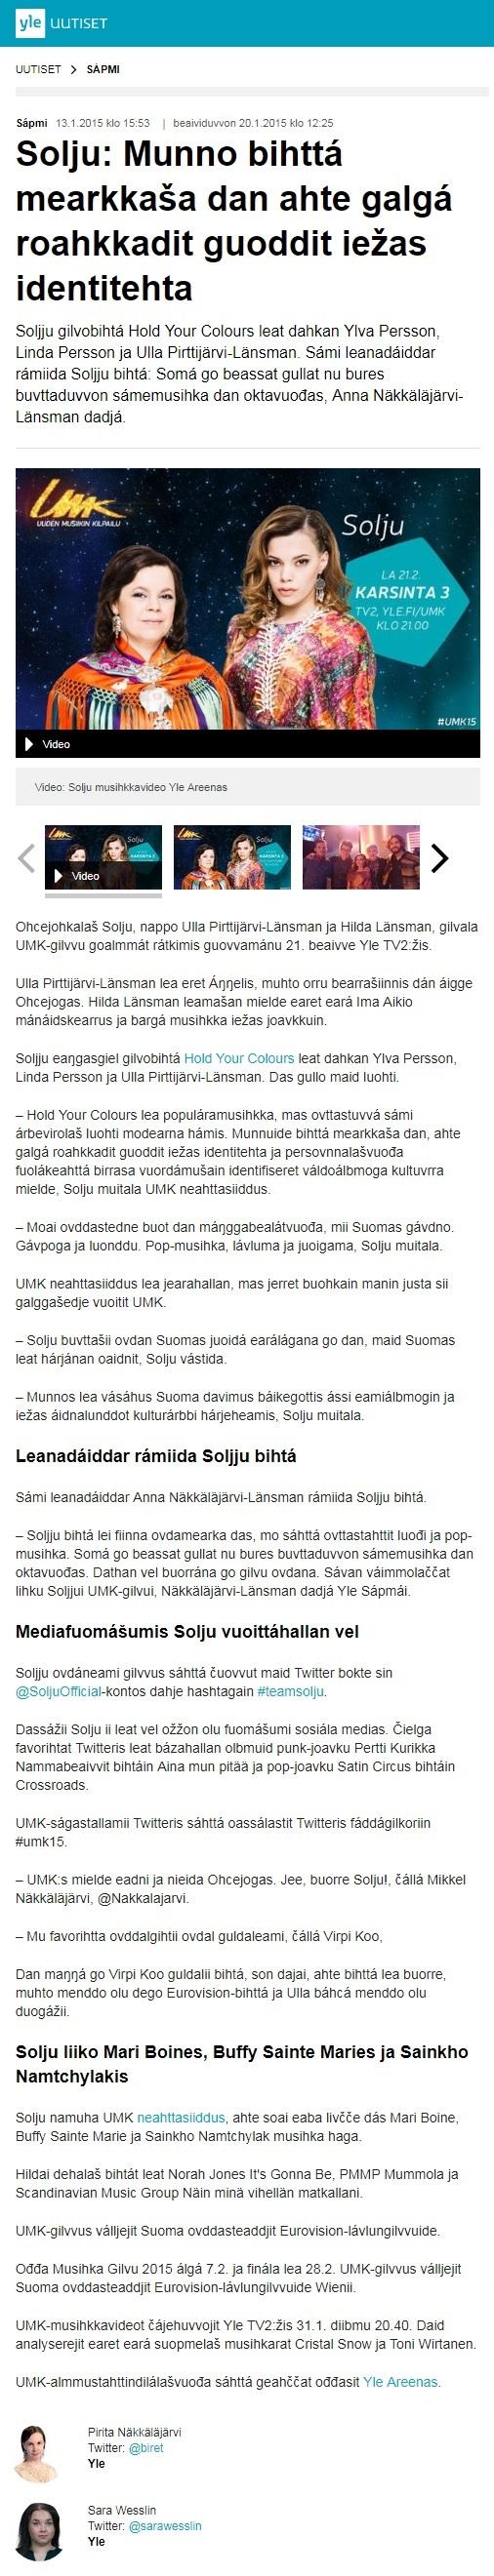 Yle Sápmi, Solju: Munno bihttá mearkkaša dan ahte galgá roahkkadit guoddit iežas identitehta (Finland), 13.1.2015